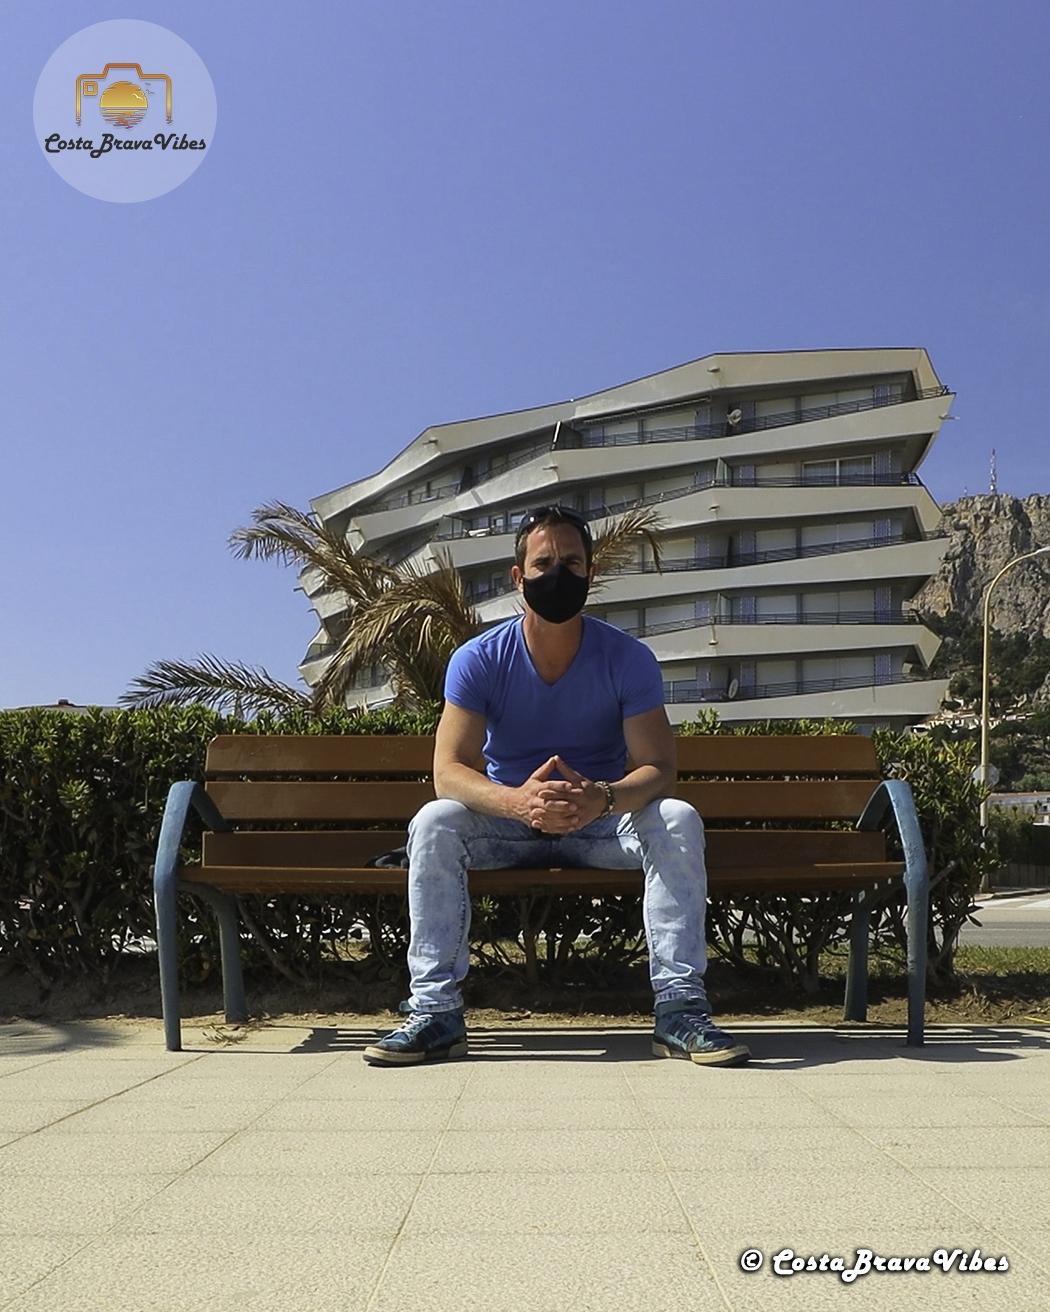 Matt EnlaCosta Estartit Costa Brava Spain Europe Portrait Bench Boulevard